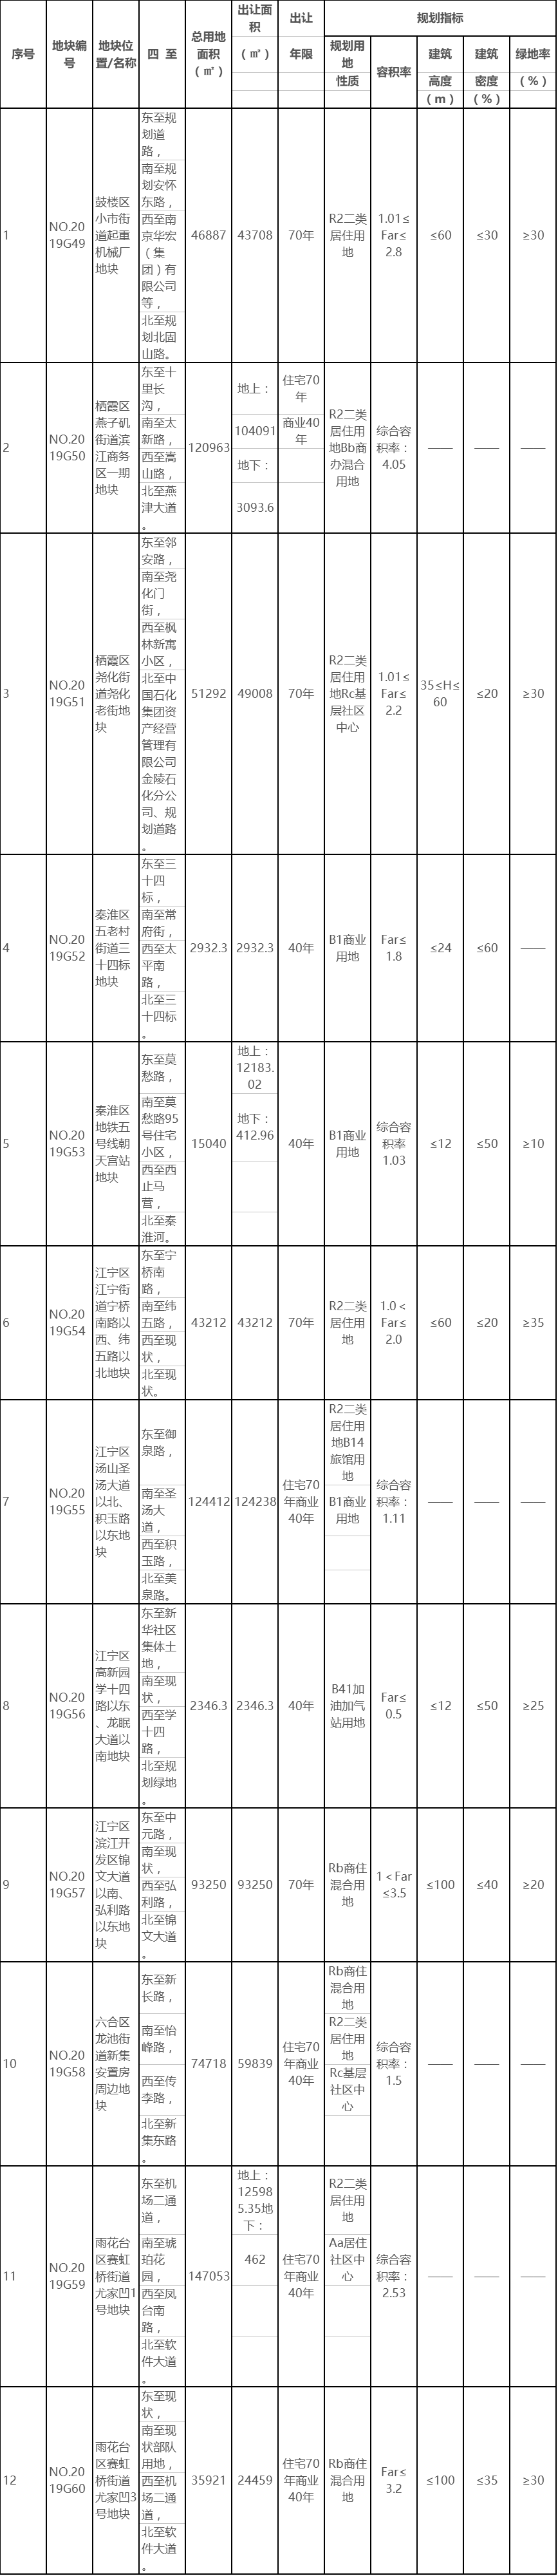 bbfac668875aa029991a941ba2f43e29.png